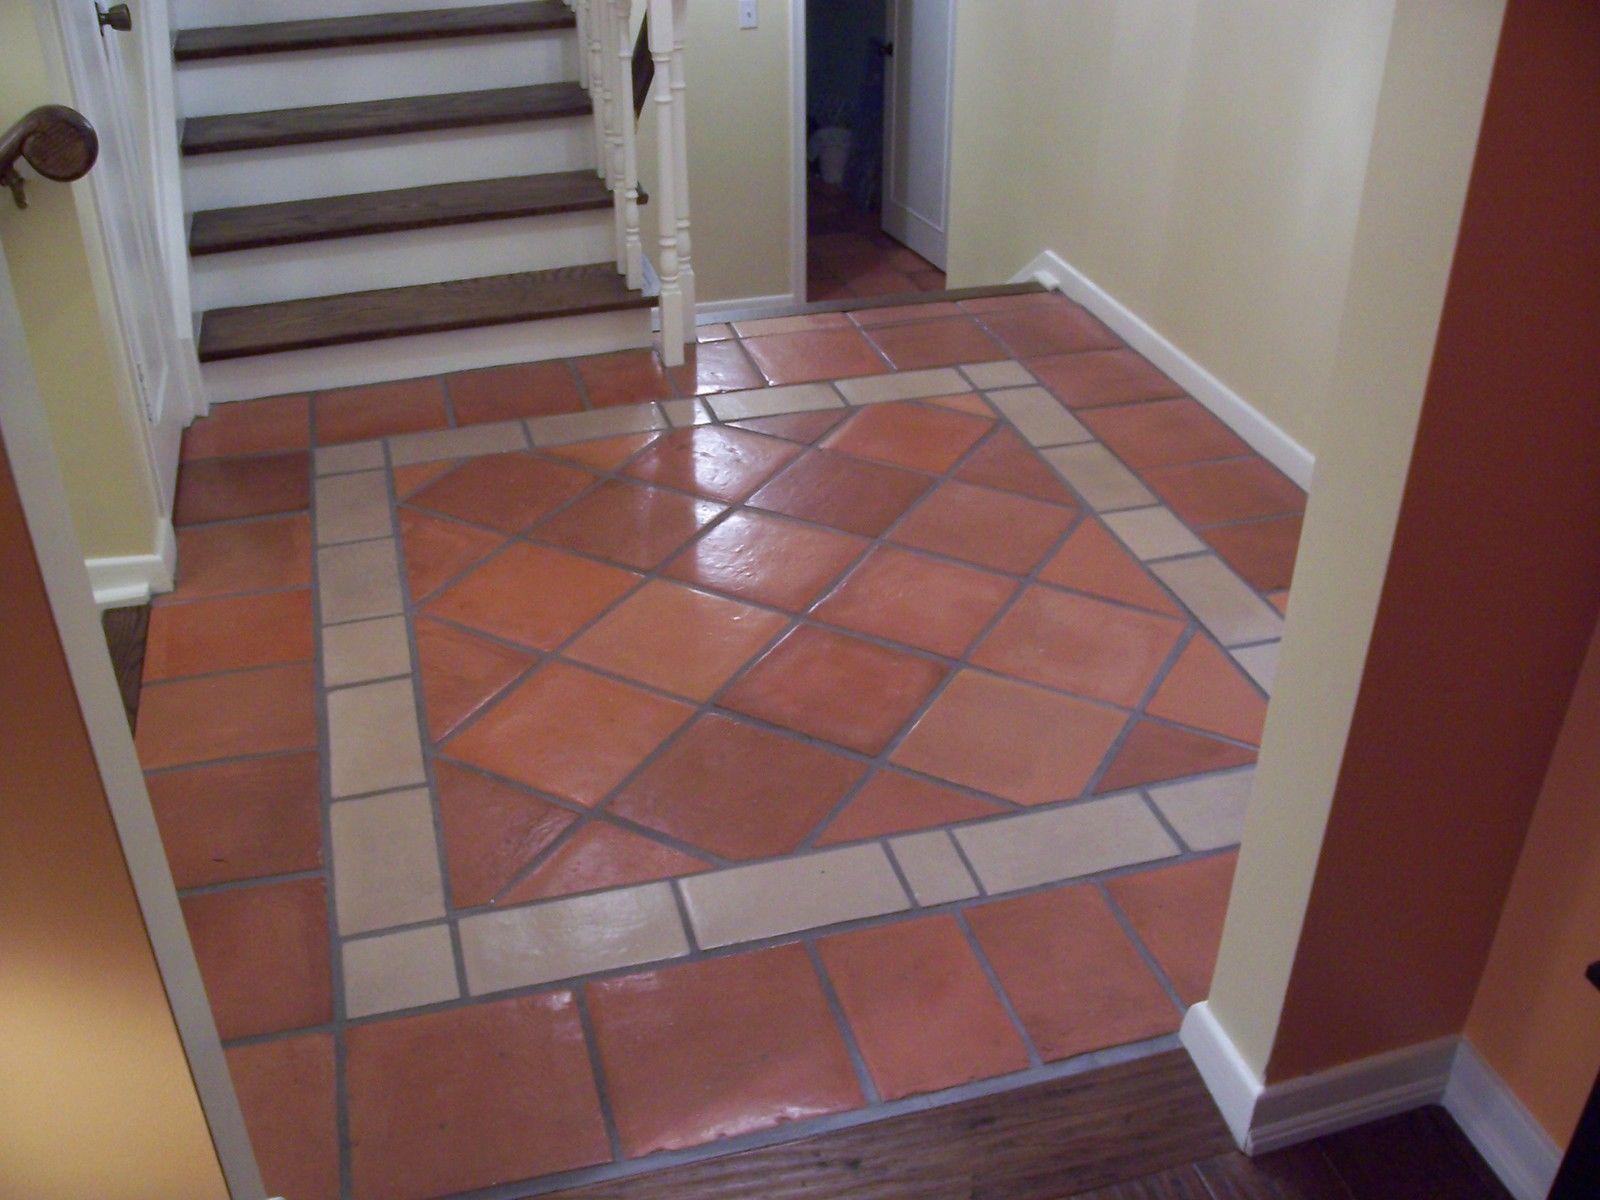 Olde Country Tile Molds (6) Make 100s 12x12 DIY Concrete Floor Tiles at $0.30 Ea